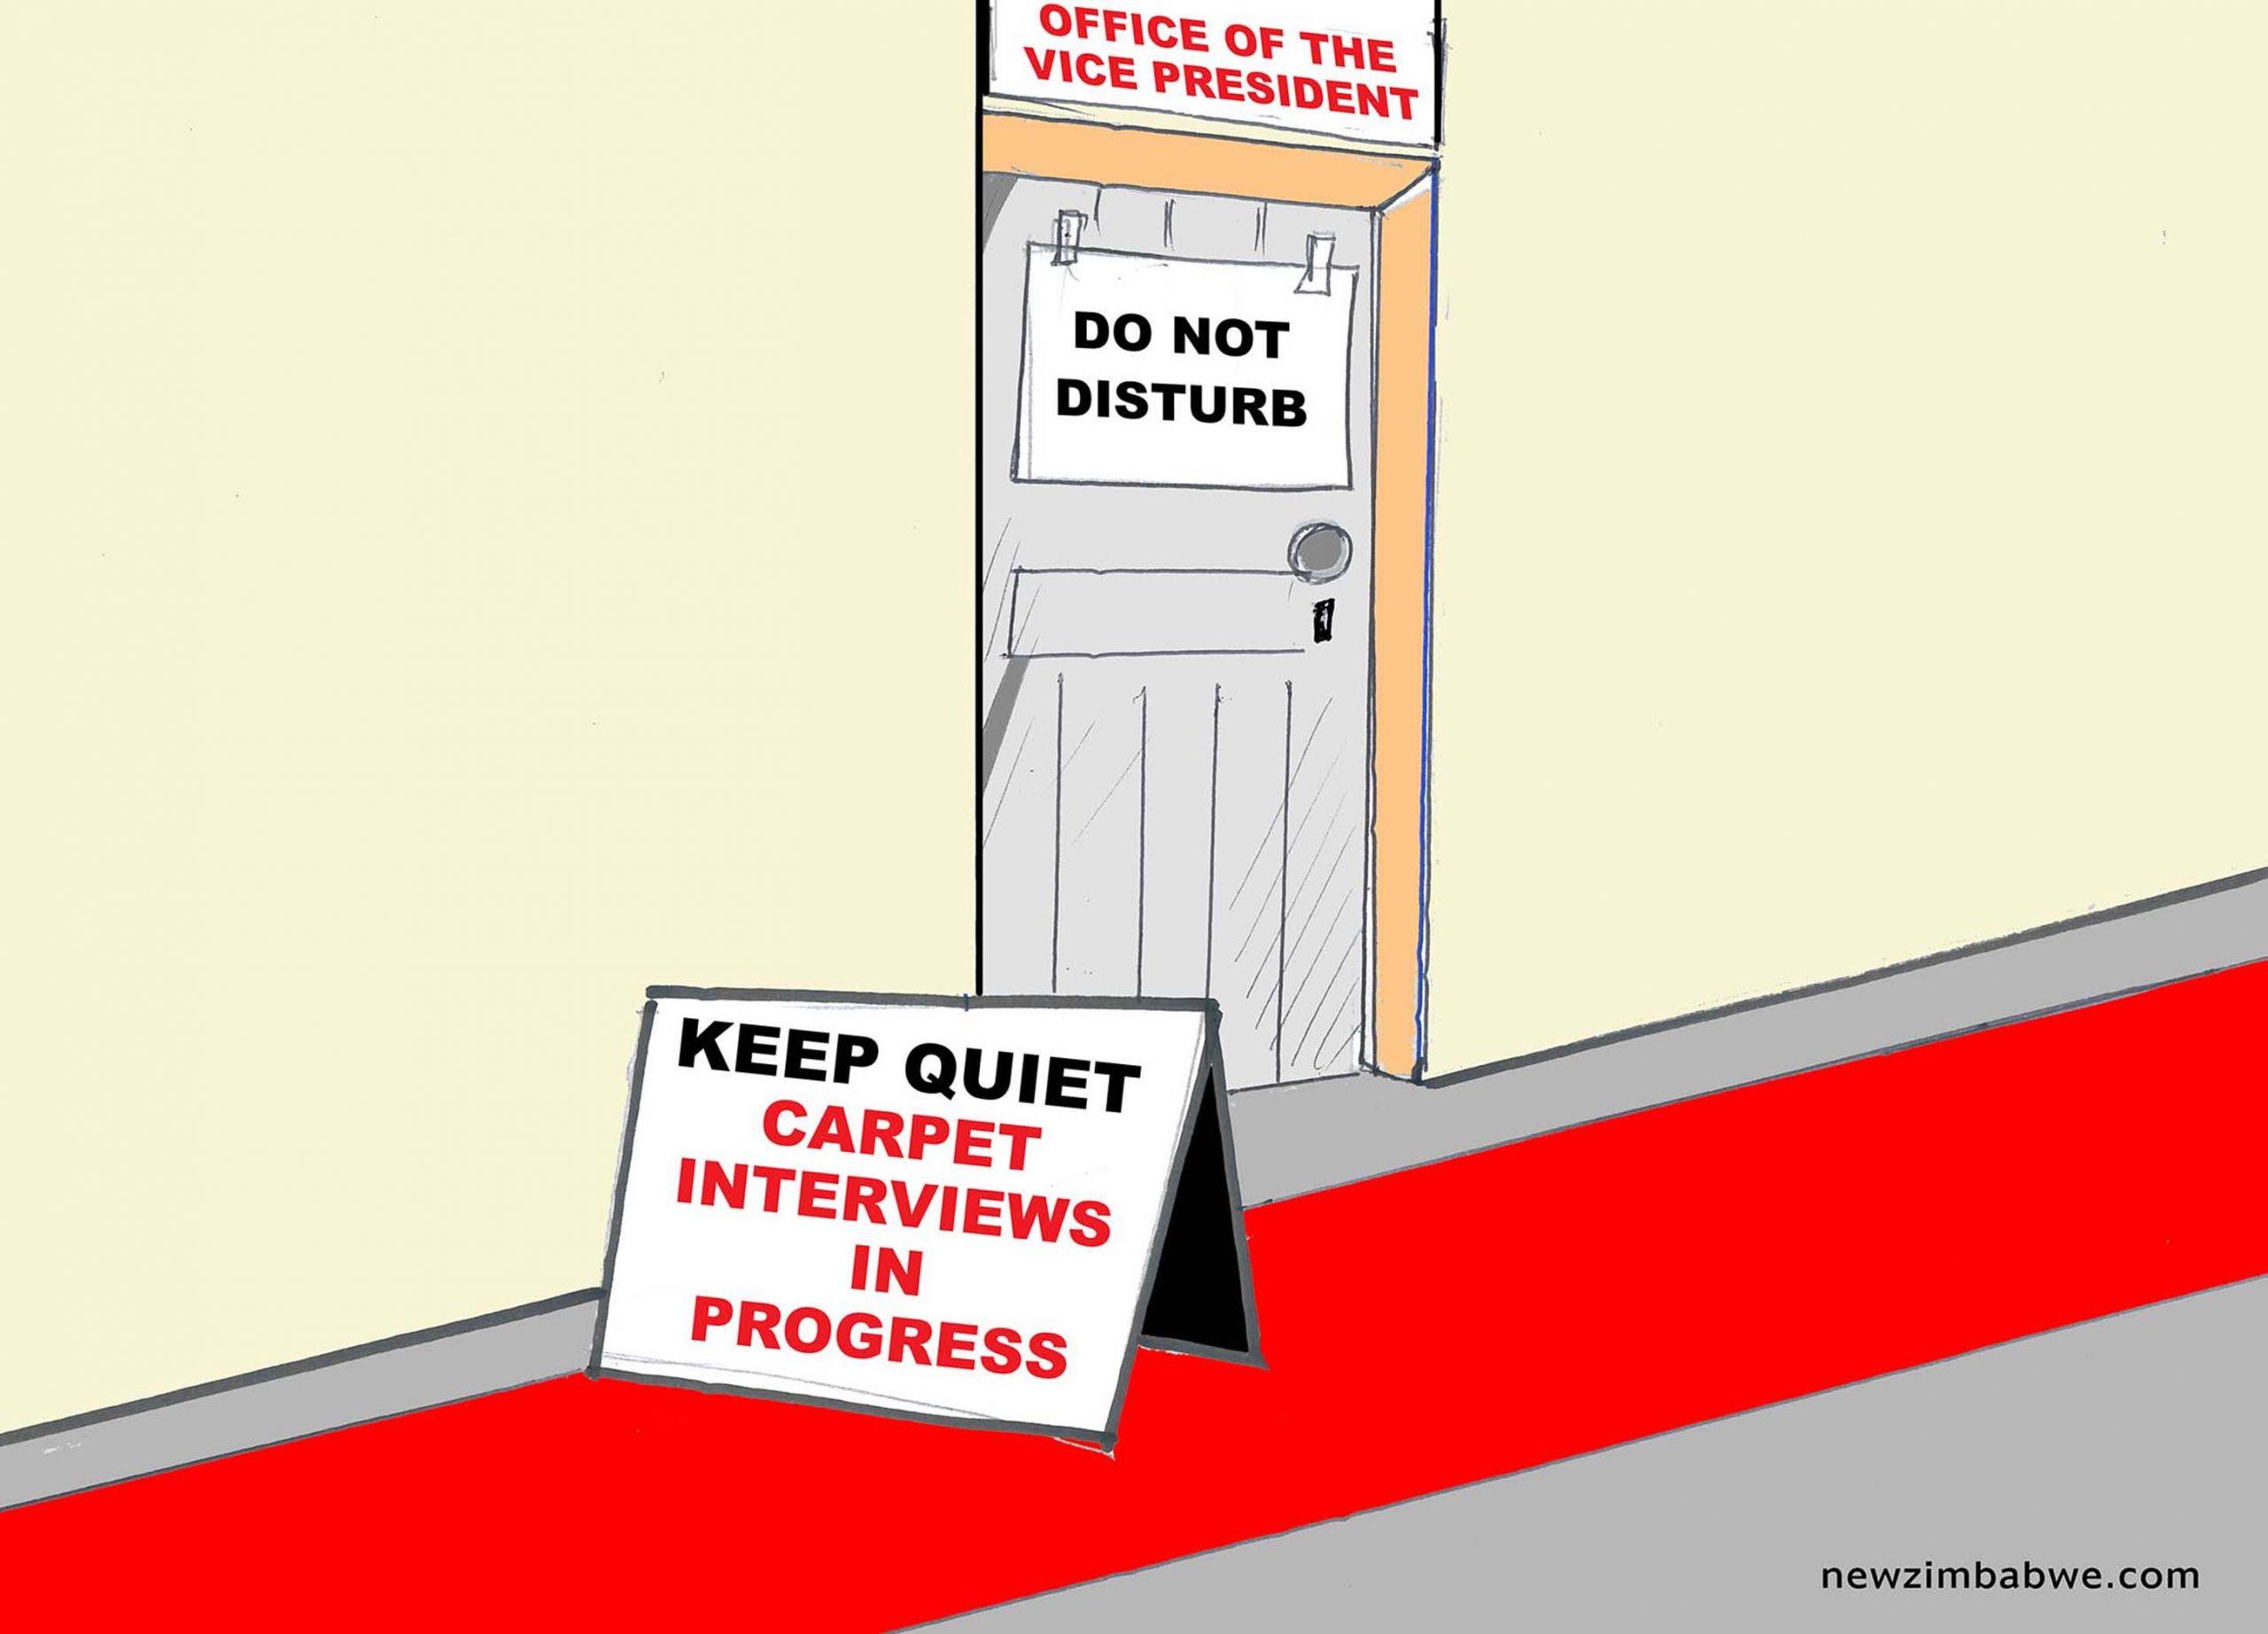 Do not disturb the VP